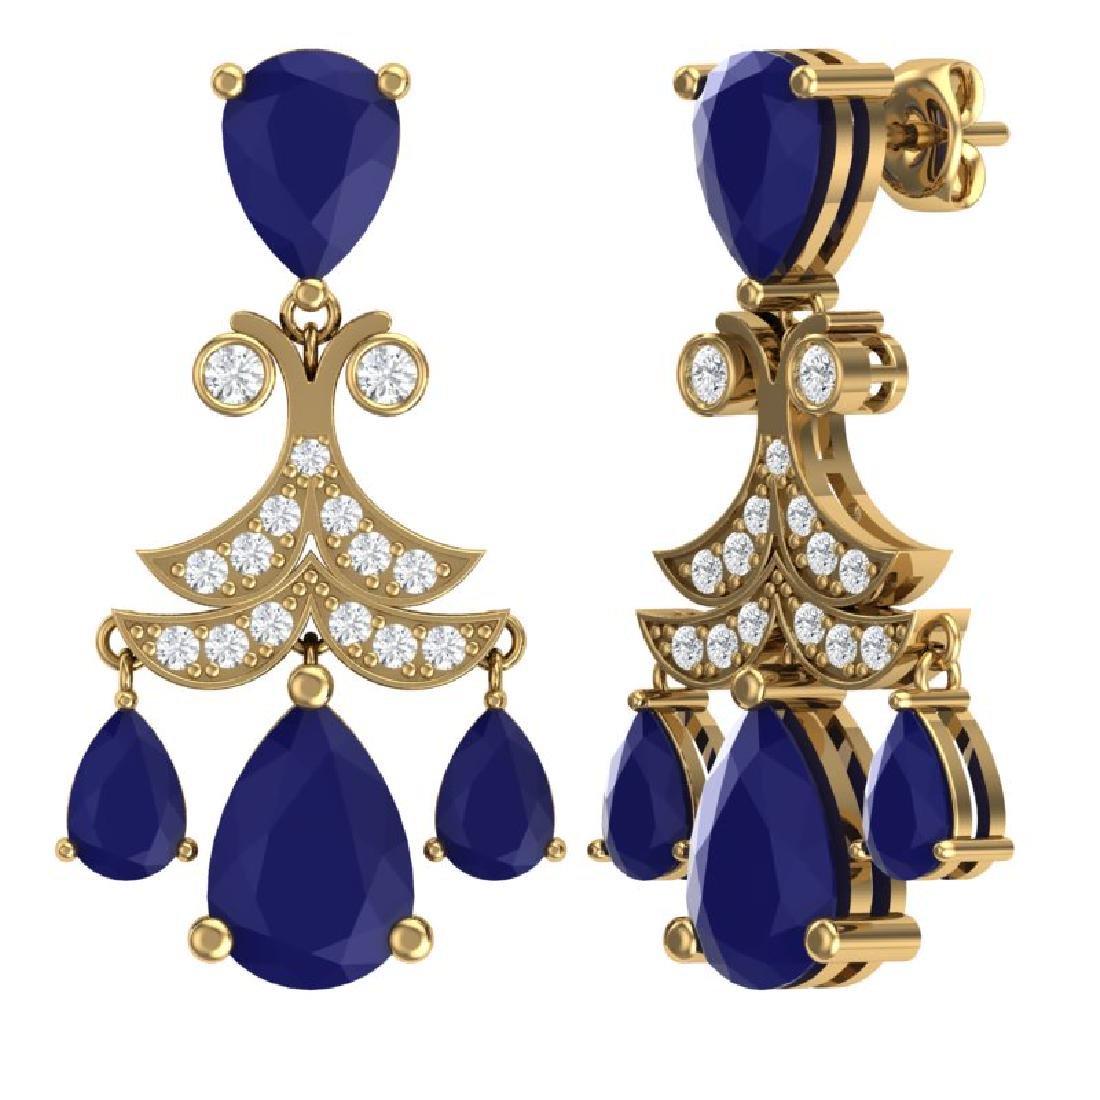 11.97 CTW Royalty Sapphire & VS Diamond Earrings 18K - 3